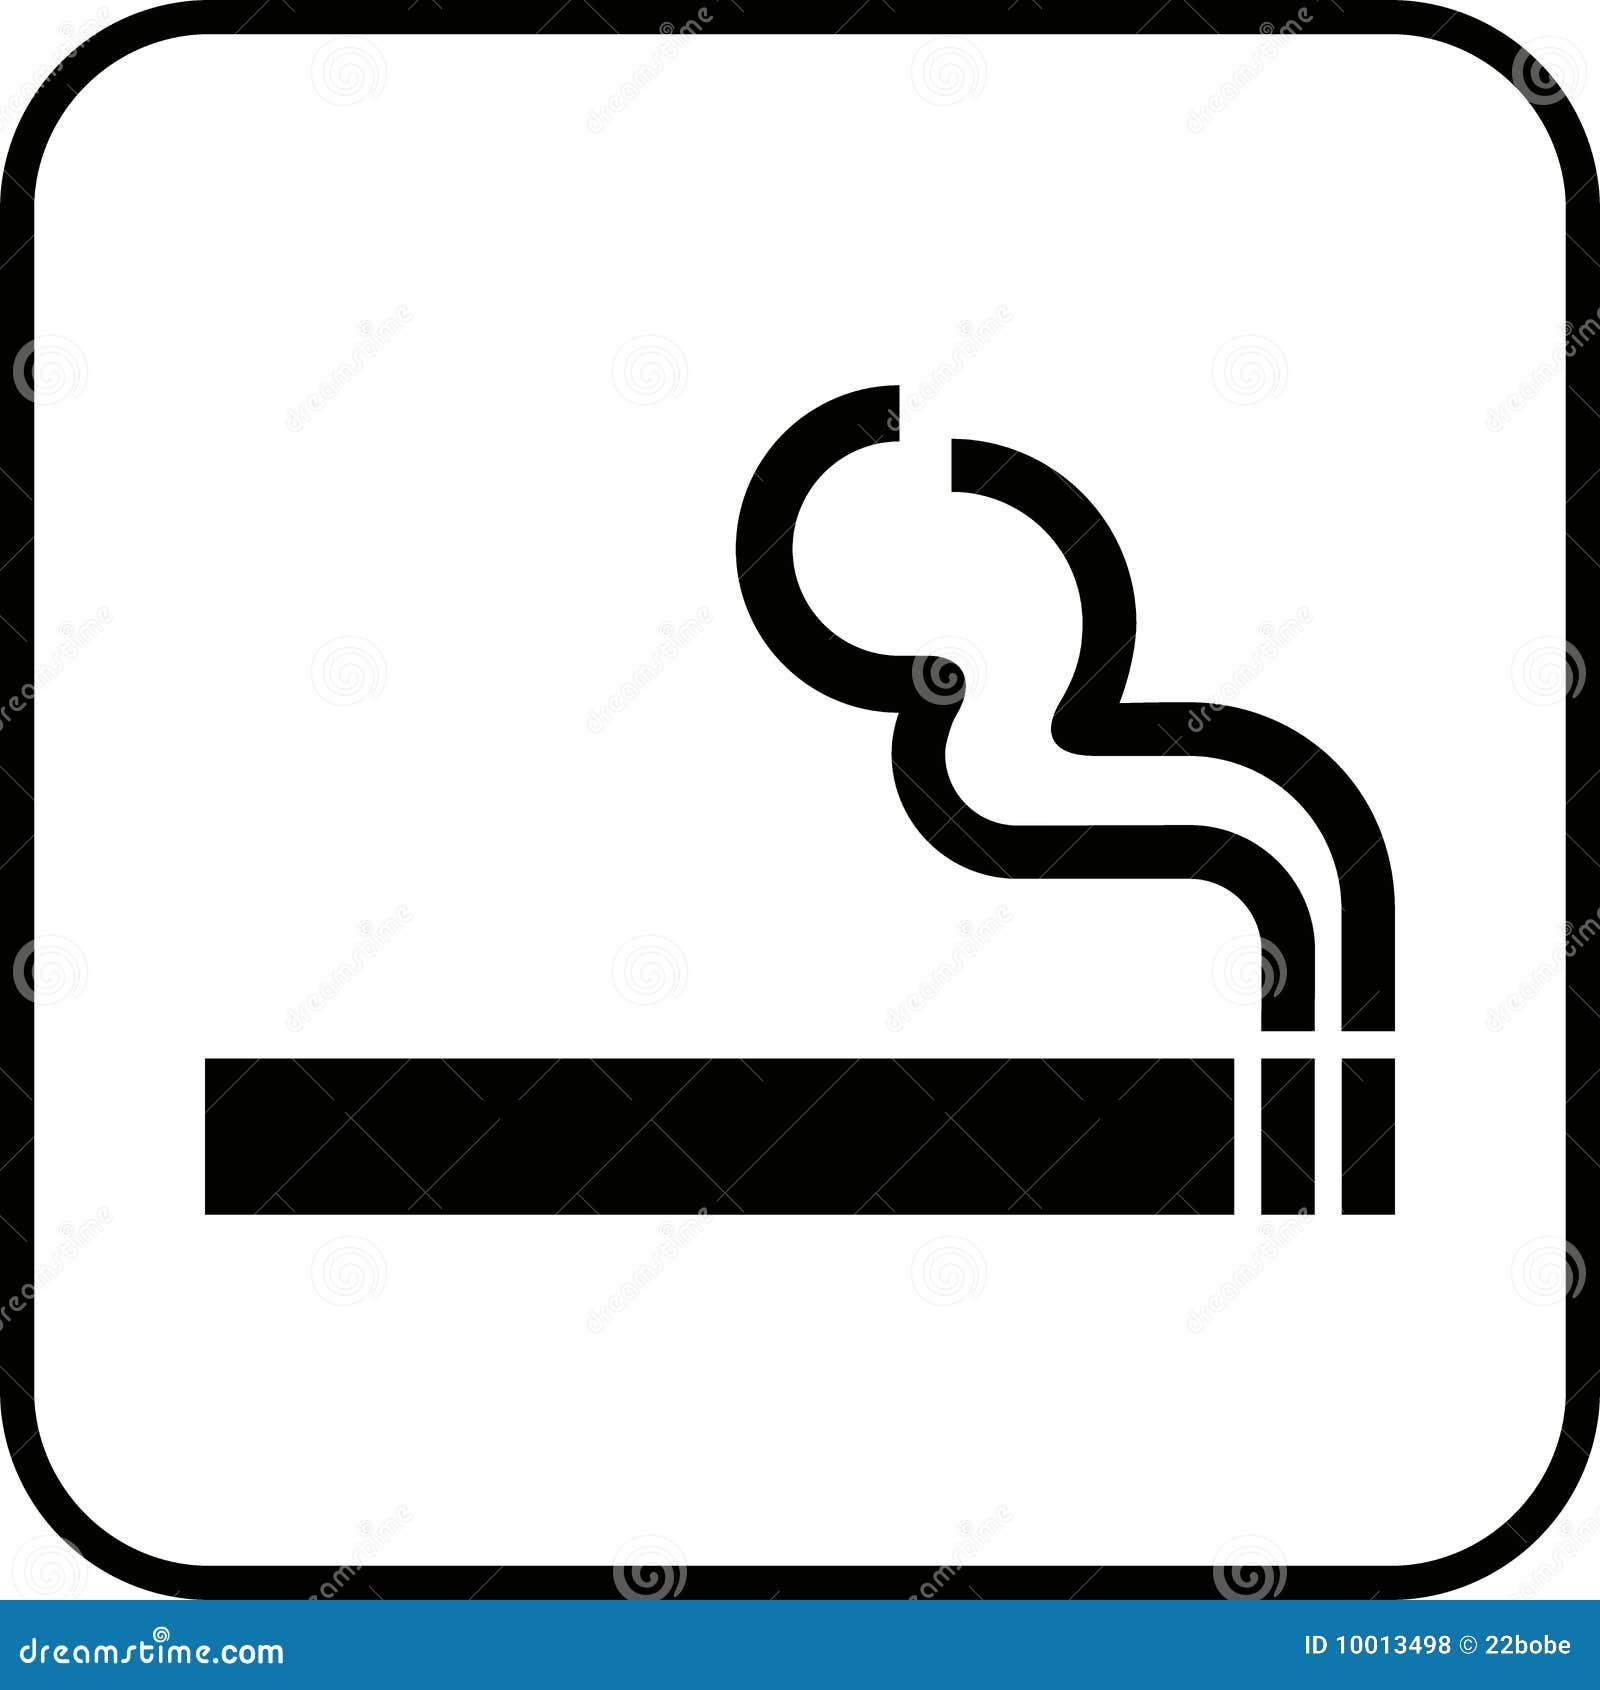 Smoking Sign 1 (+ Vector) Royalty Free Stock Photos - Image: 10013498